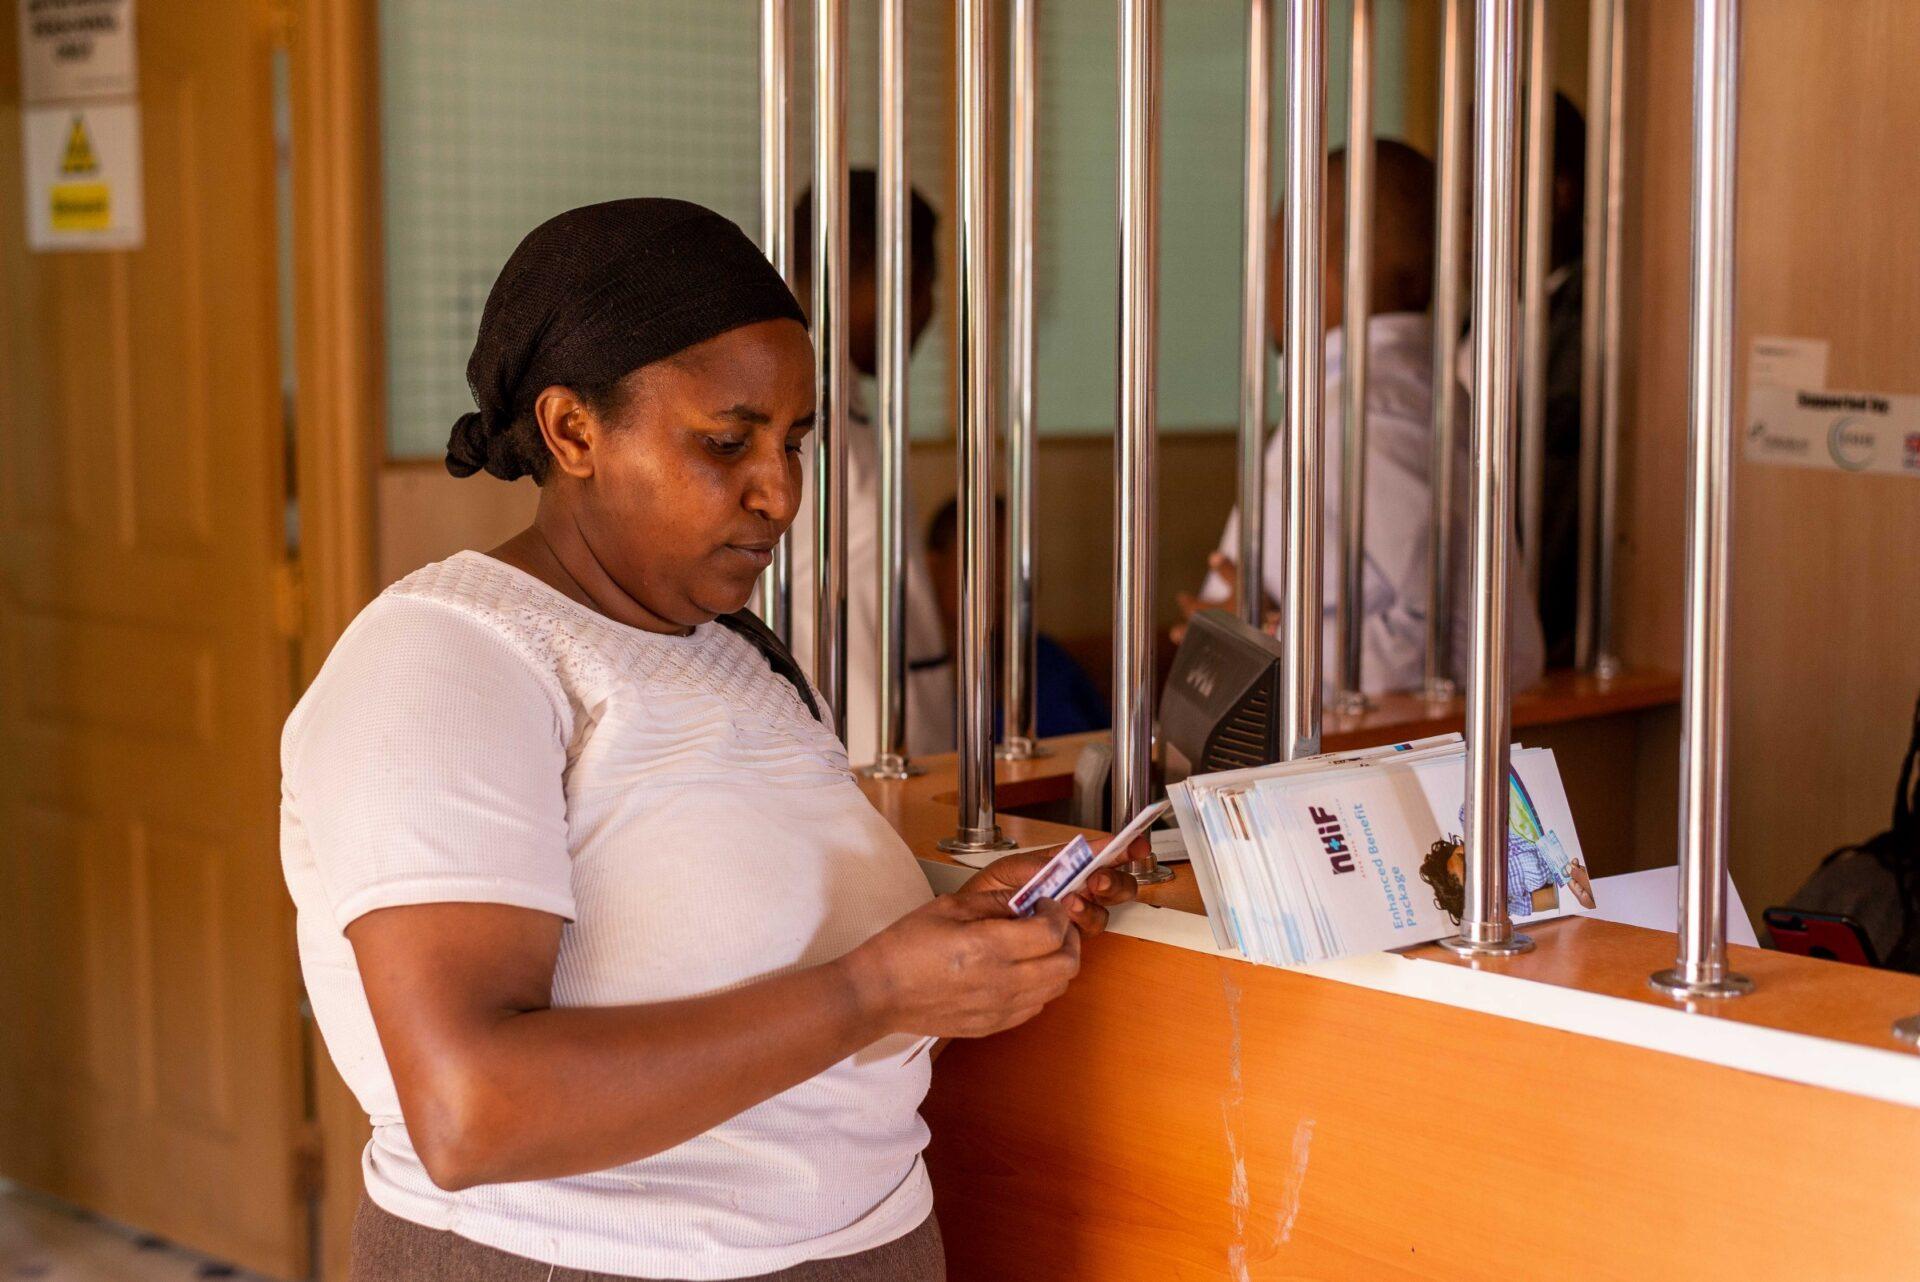 A PROFIT Financial Graduation participant in Samburu, Kenya visits a local NHIF facility.